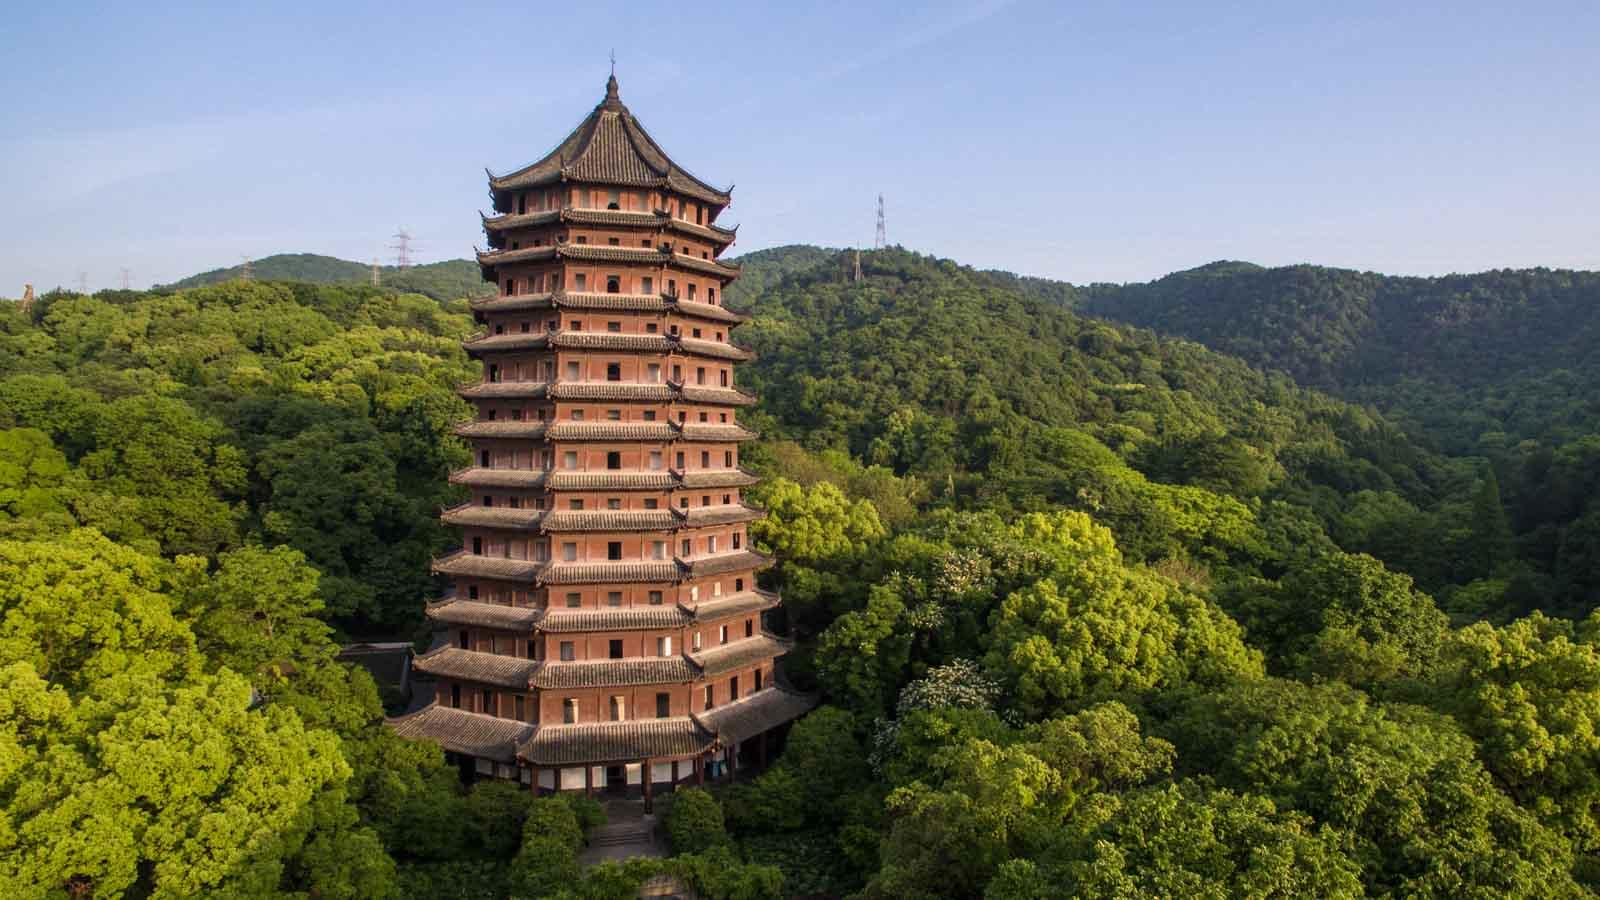 Liuhe Six Harmonies Pagoda